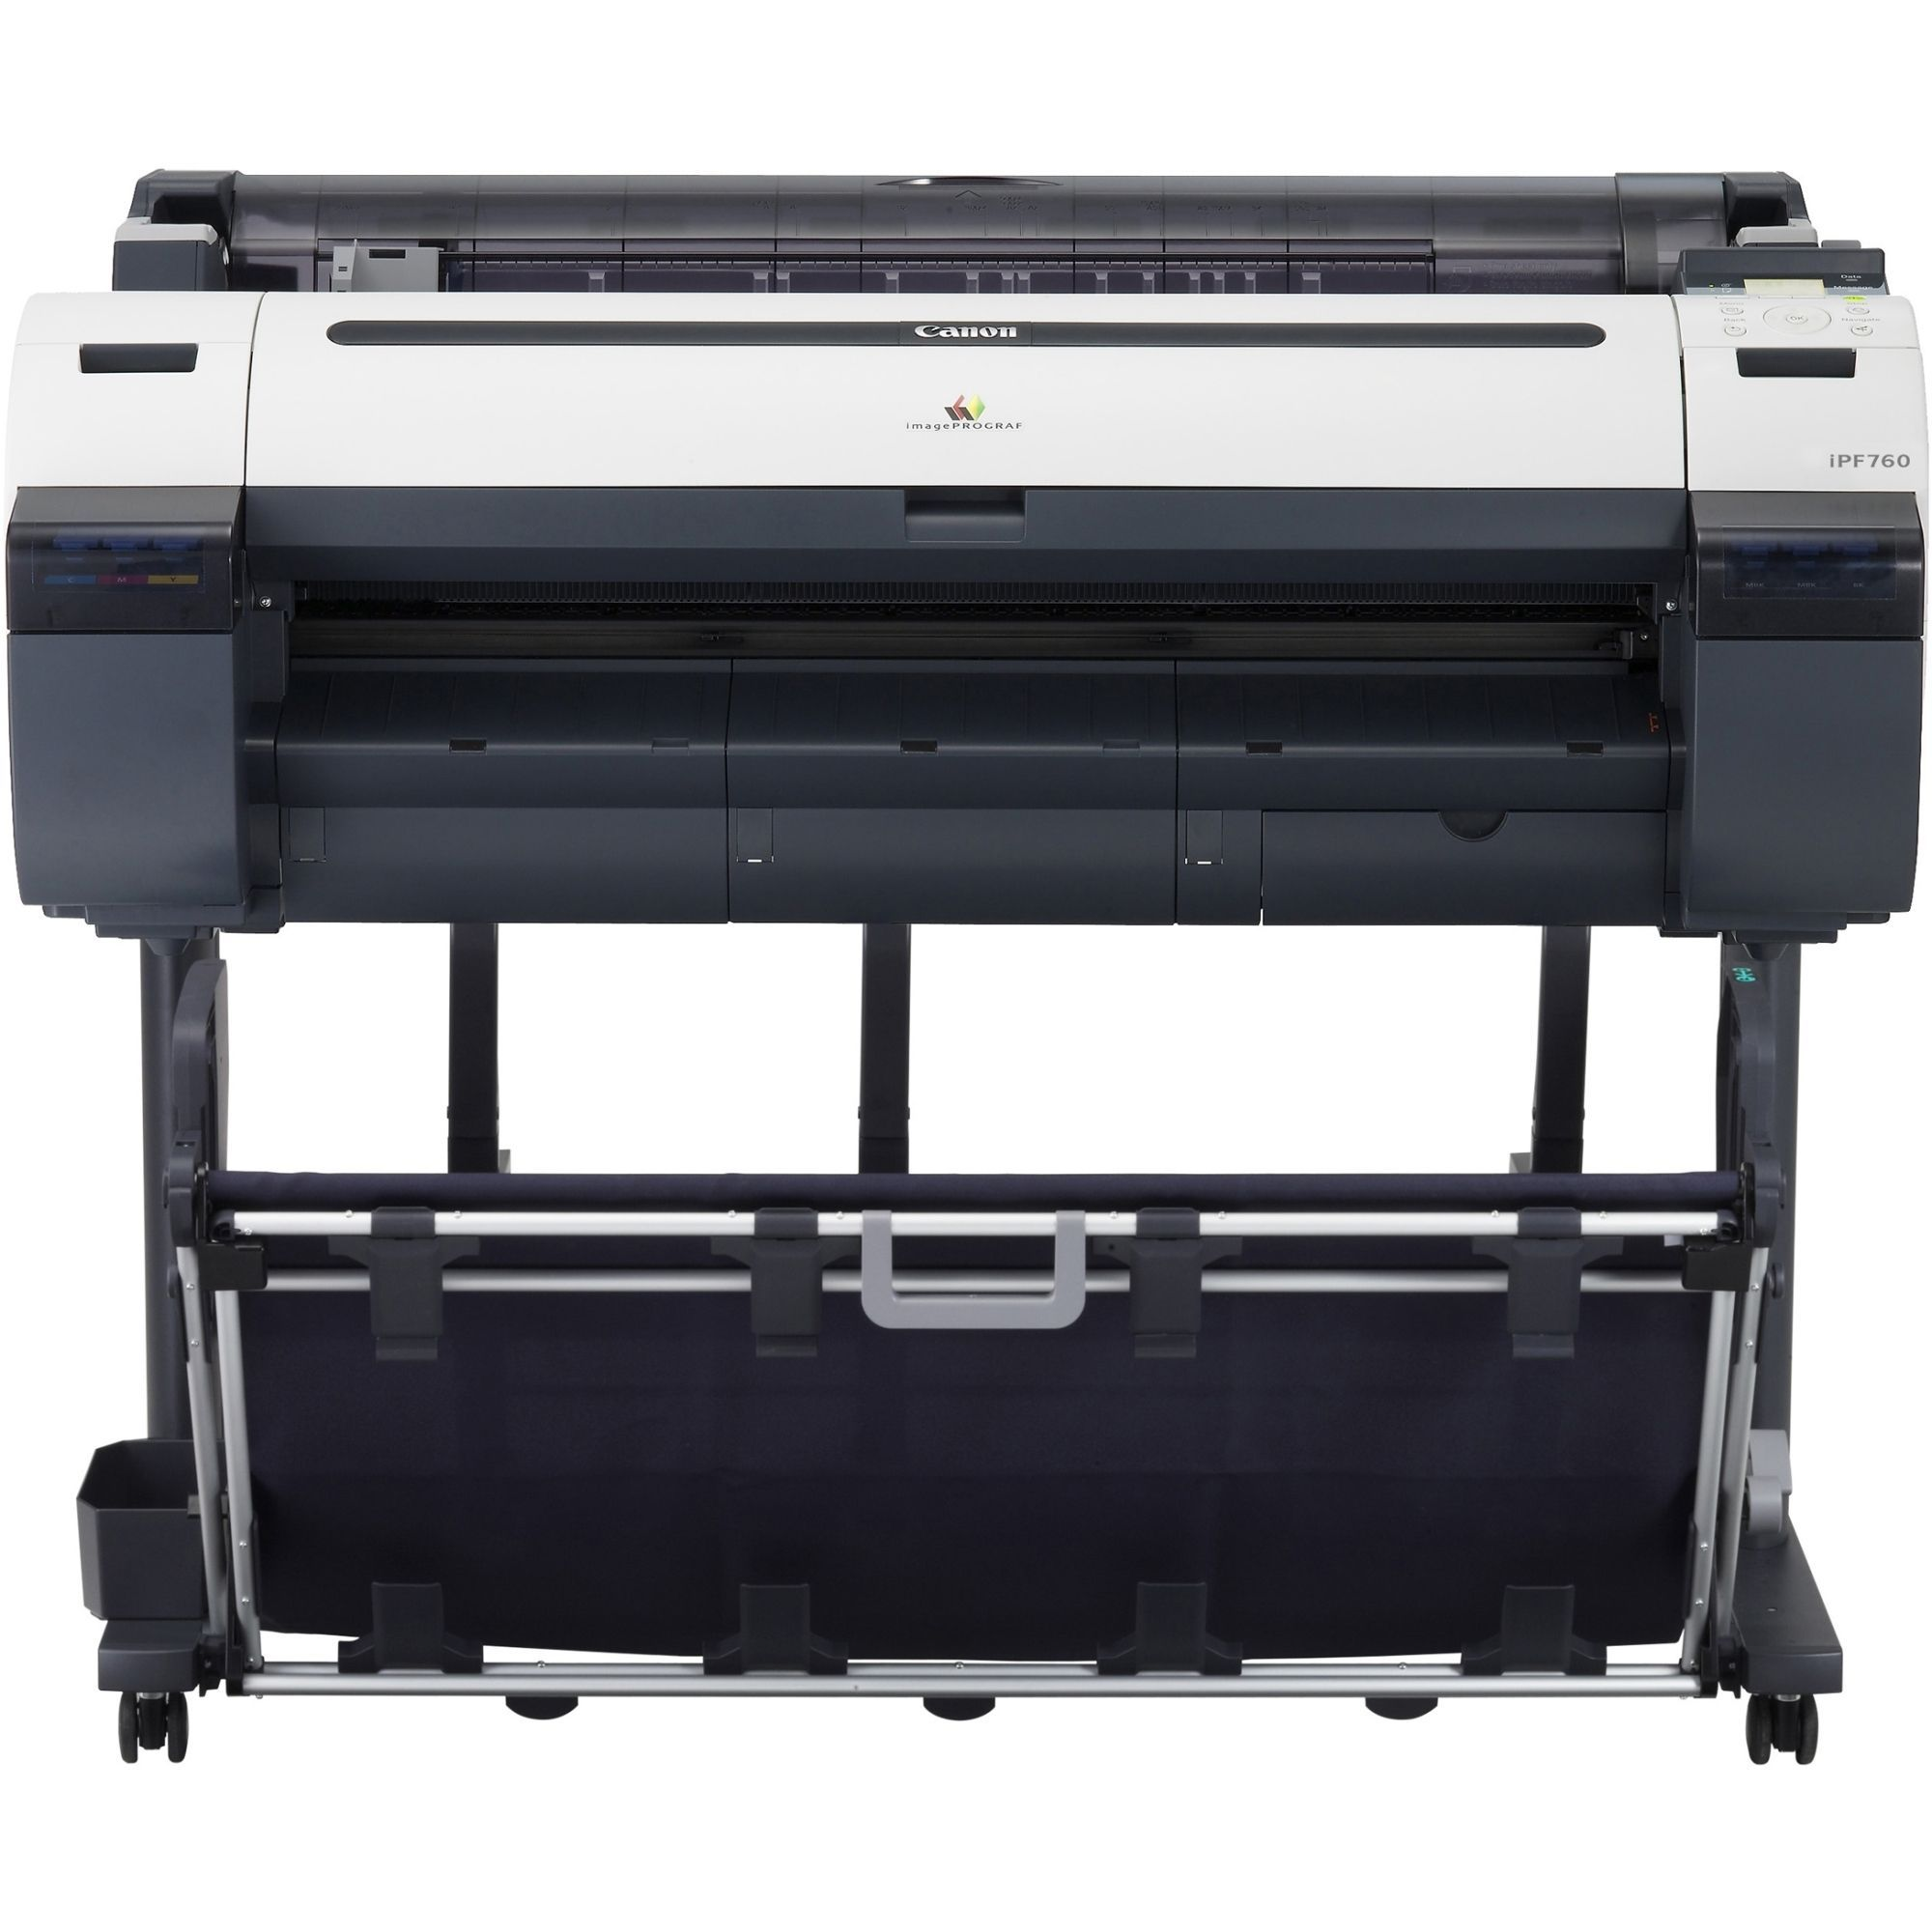 Canon imagePROGRAF iPF760 Inkjet Format Printer - 36